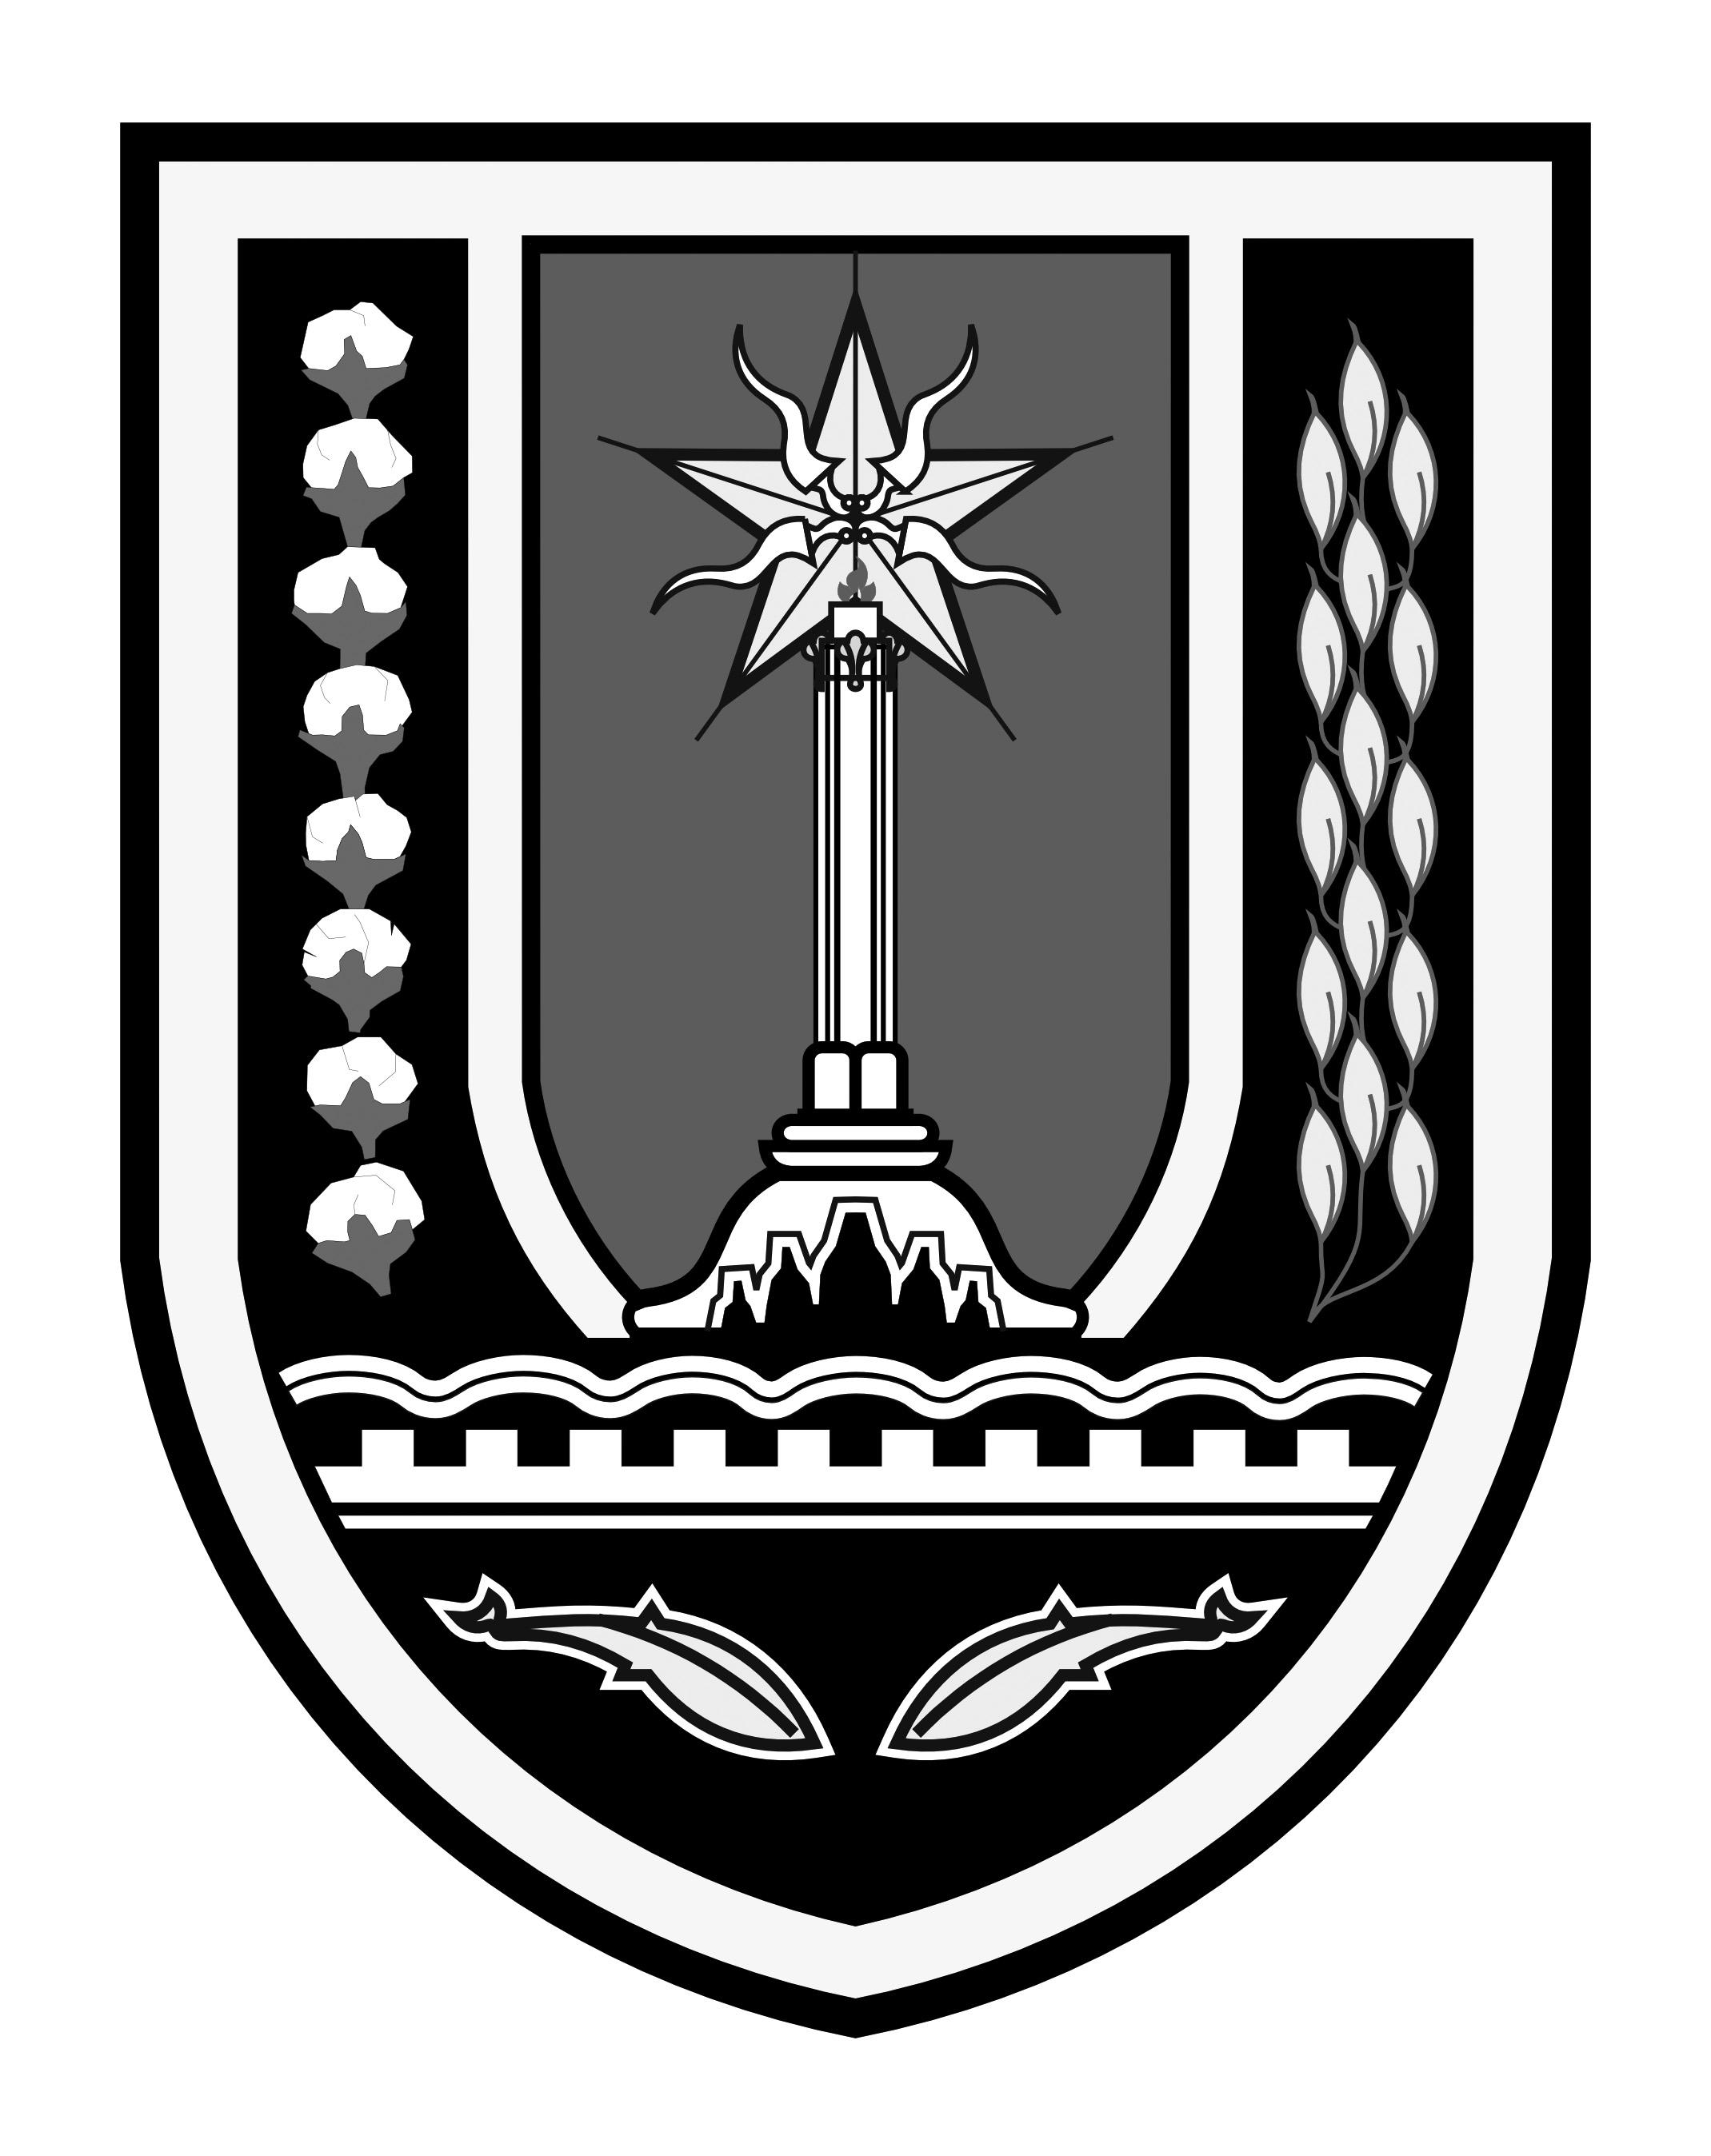 Logo Kota Semarang (Provinsi Jawa Tengah) Original Grayscale